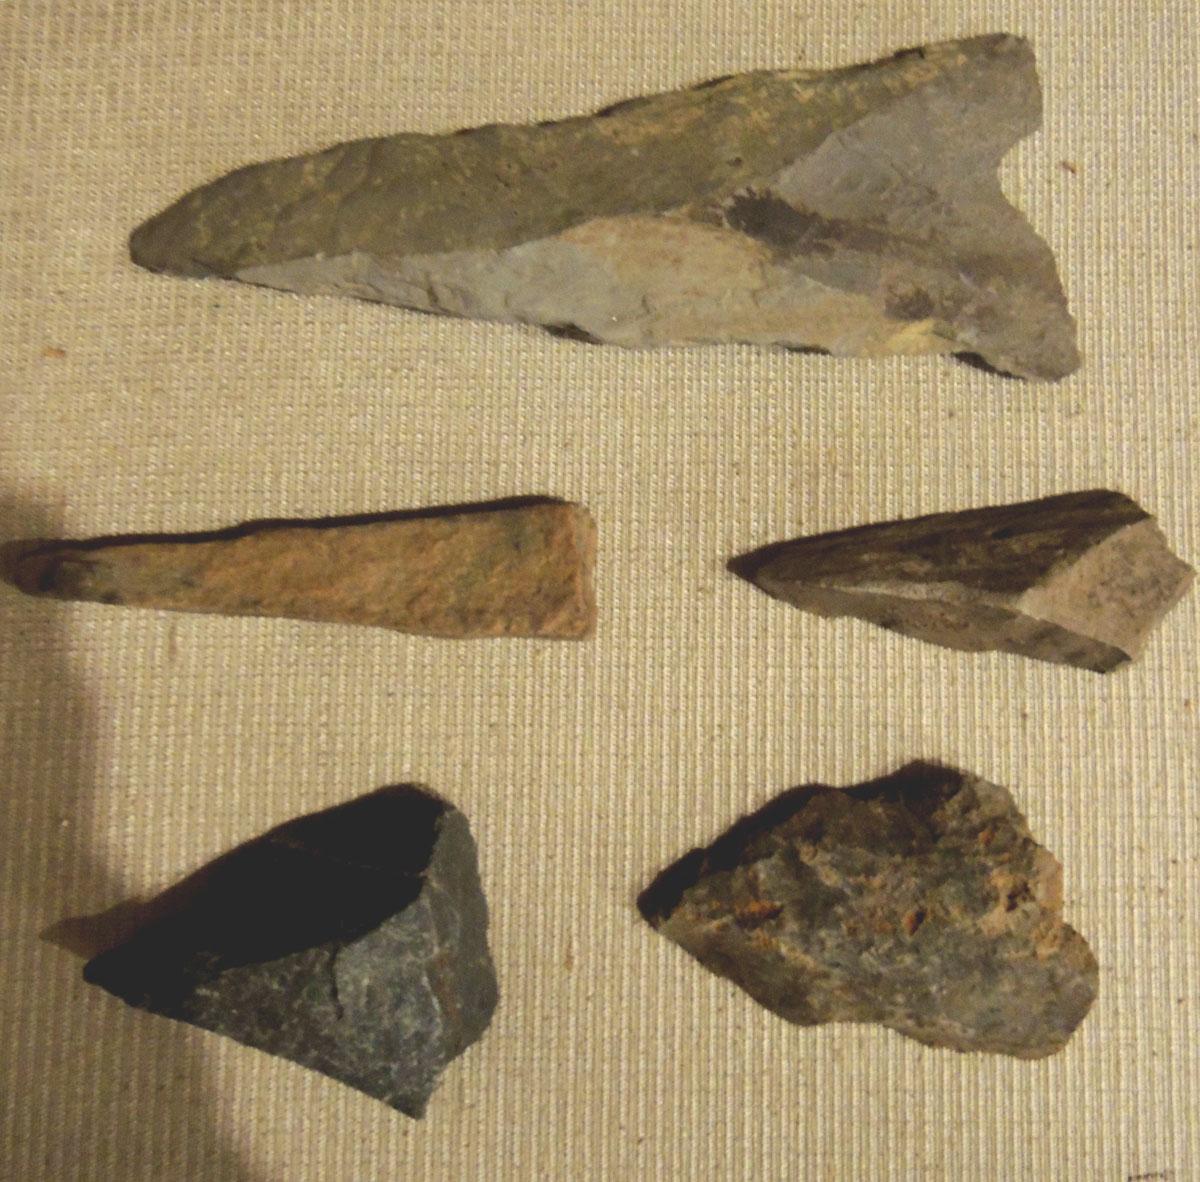 Pequossett Indian arrowheads found in Belmont